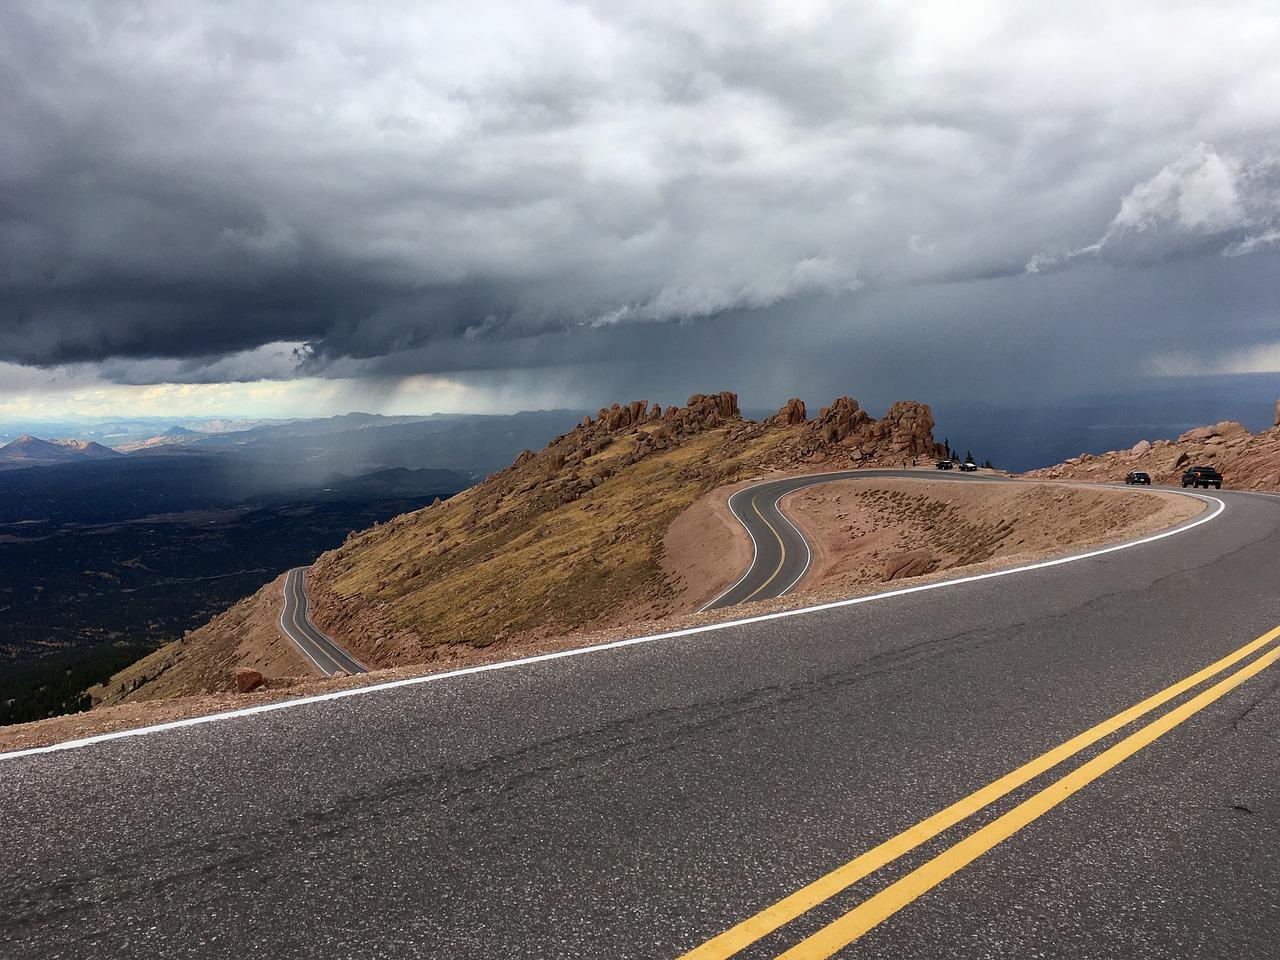 Long Road High Peak Peak High Mountain Free Image From Needpix Com